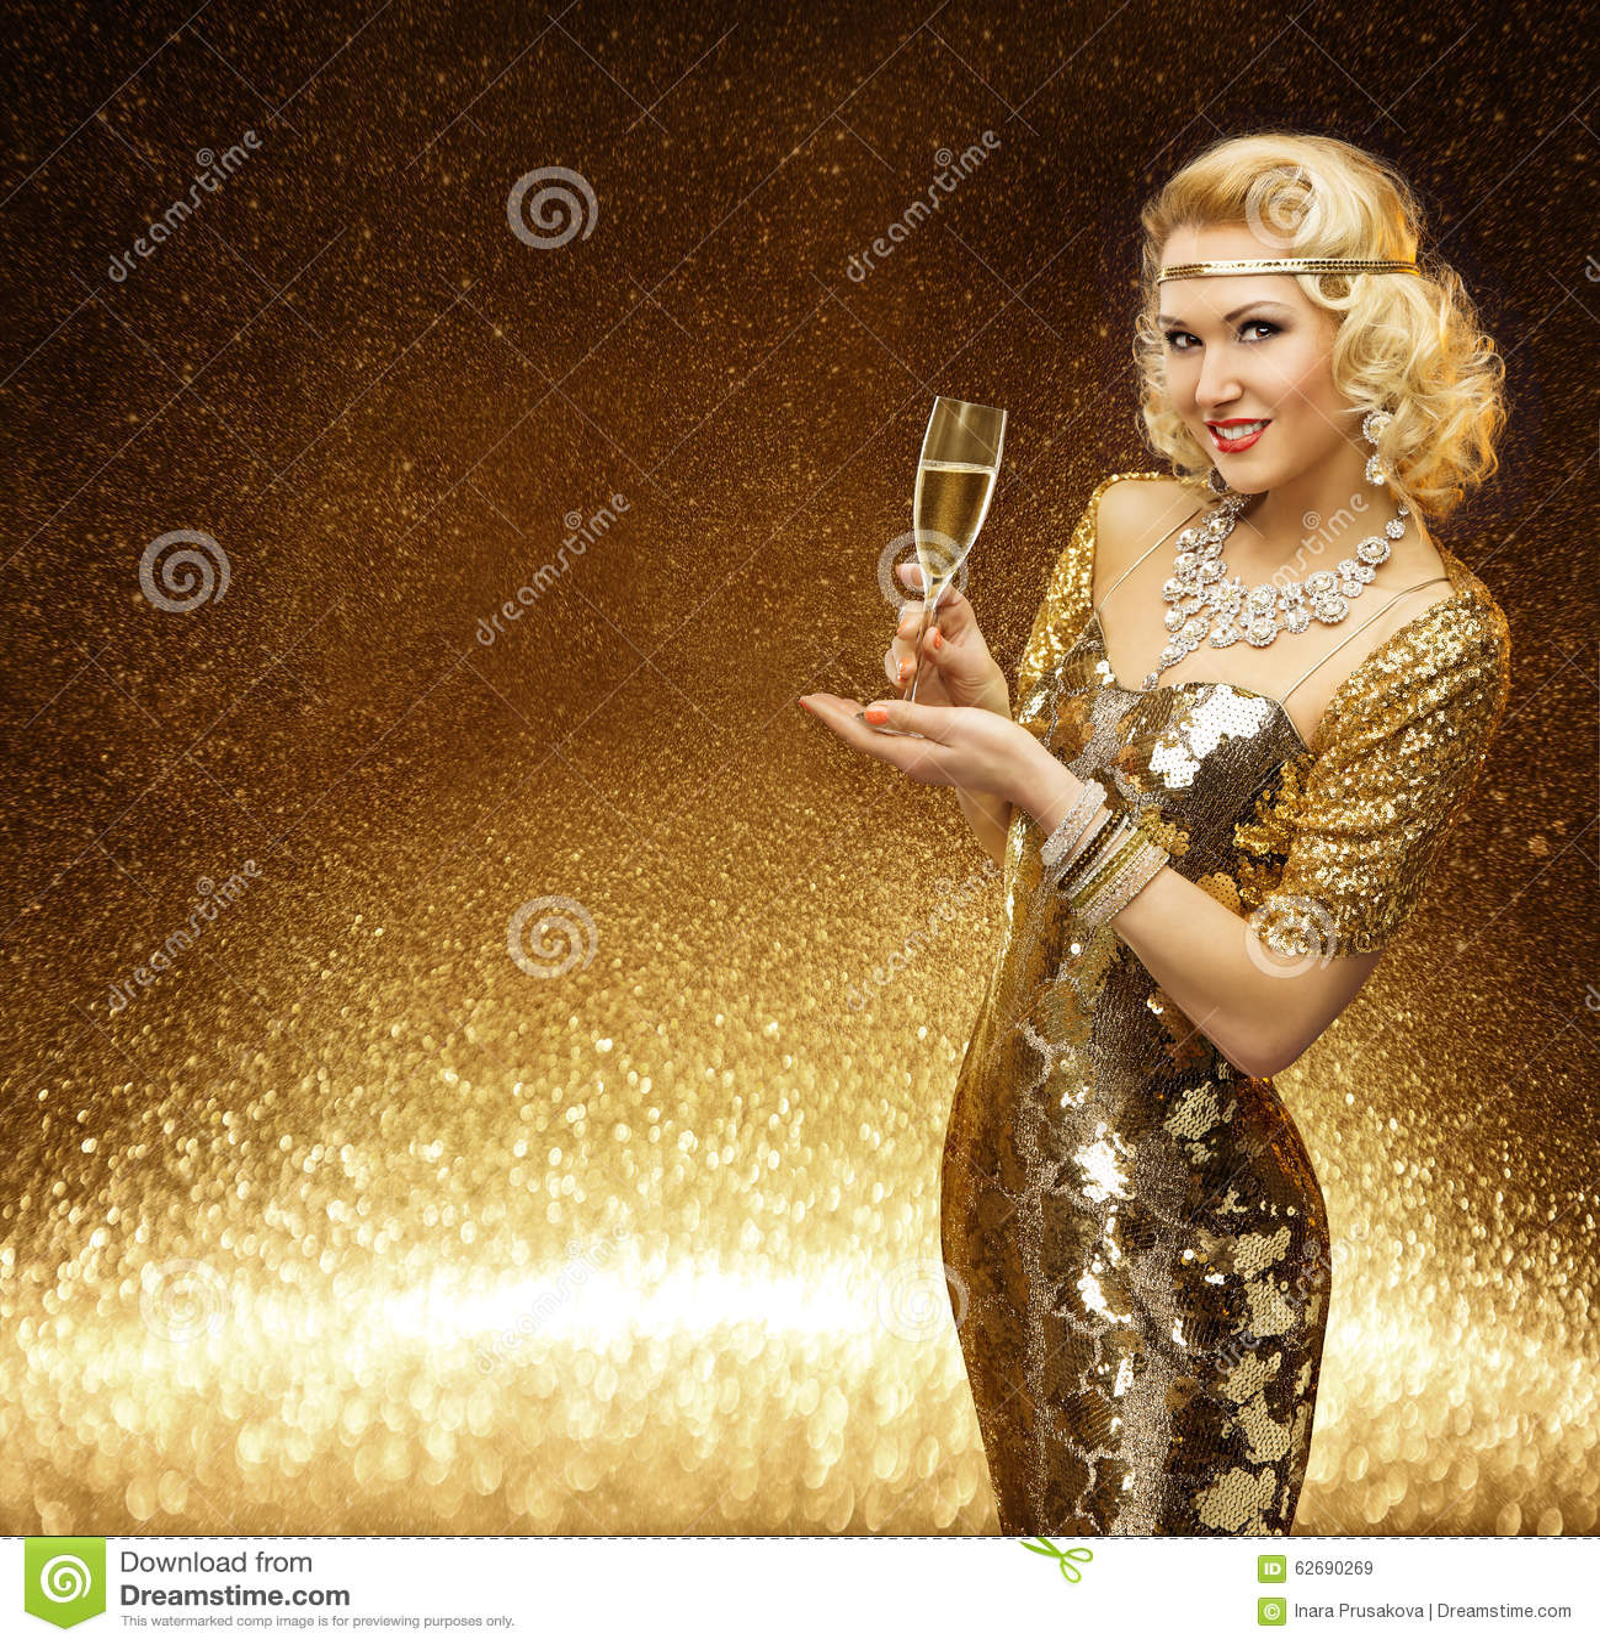 Woman Gold, VIP Lady Champagne Glass, Golden Fashion Model